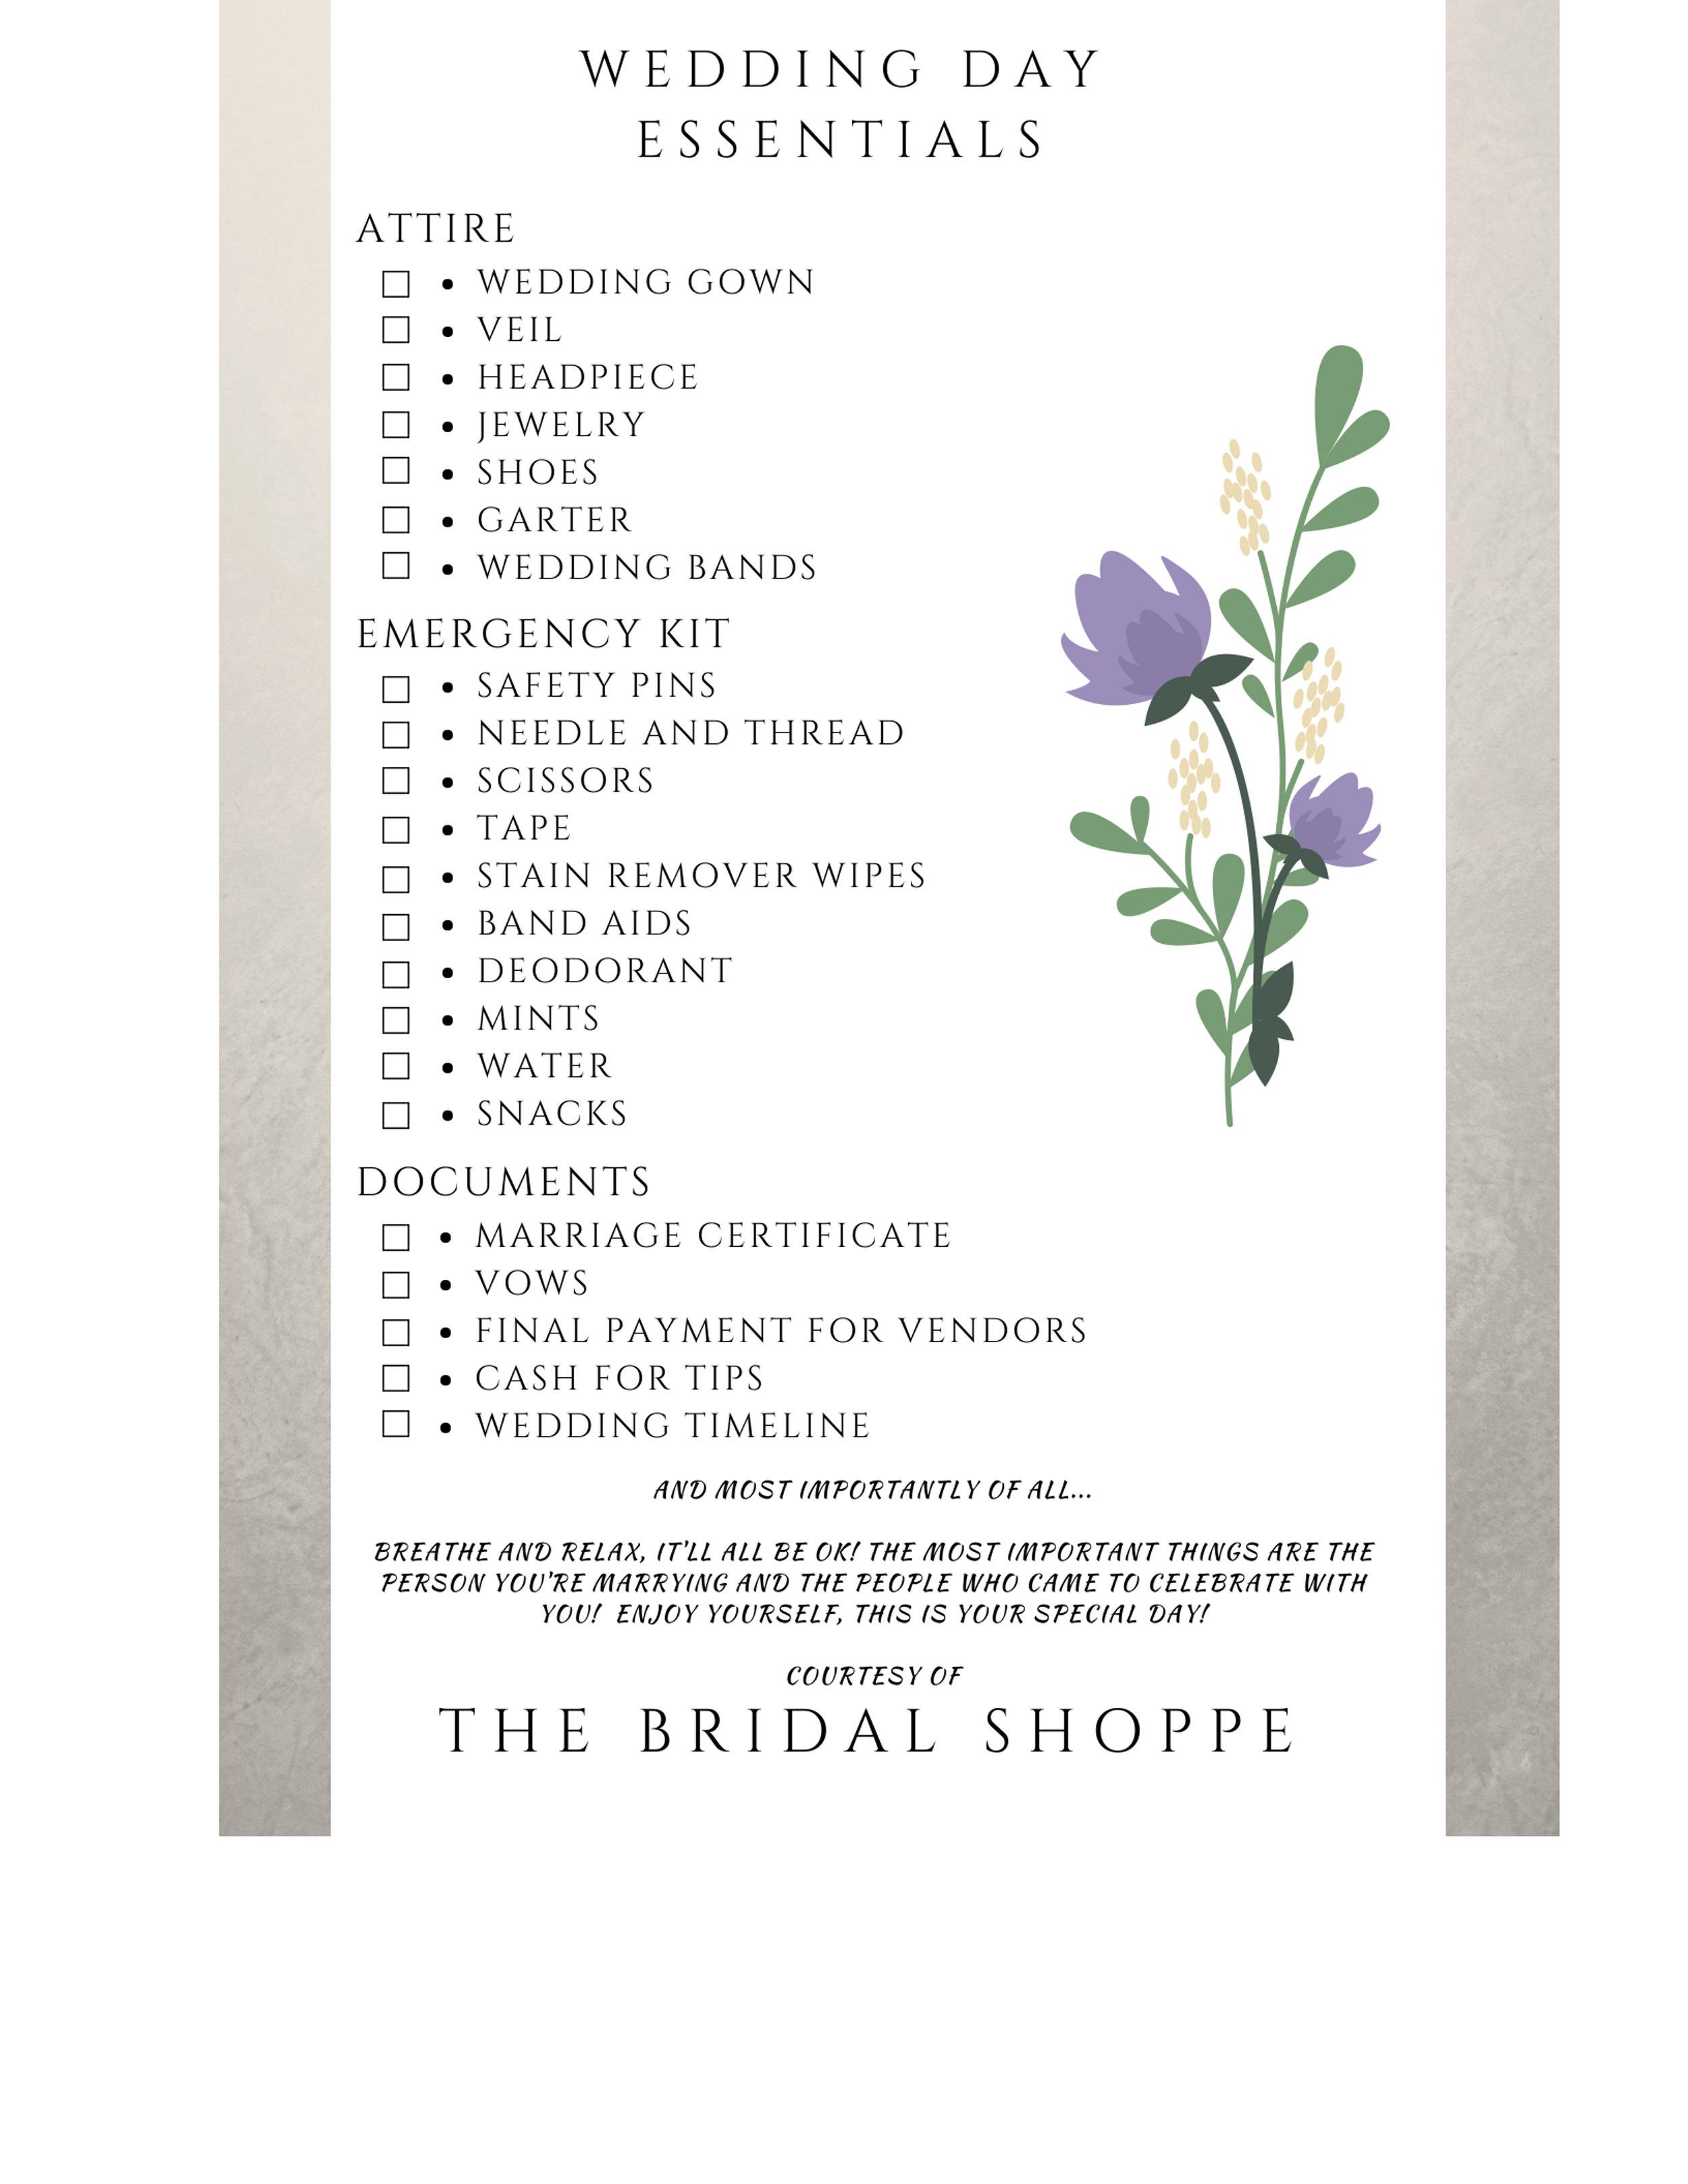 Wedding Day Checklist.jpg